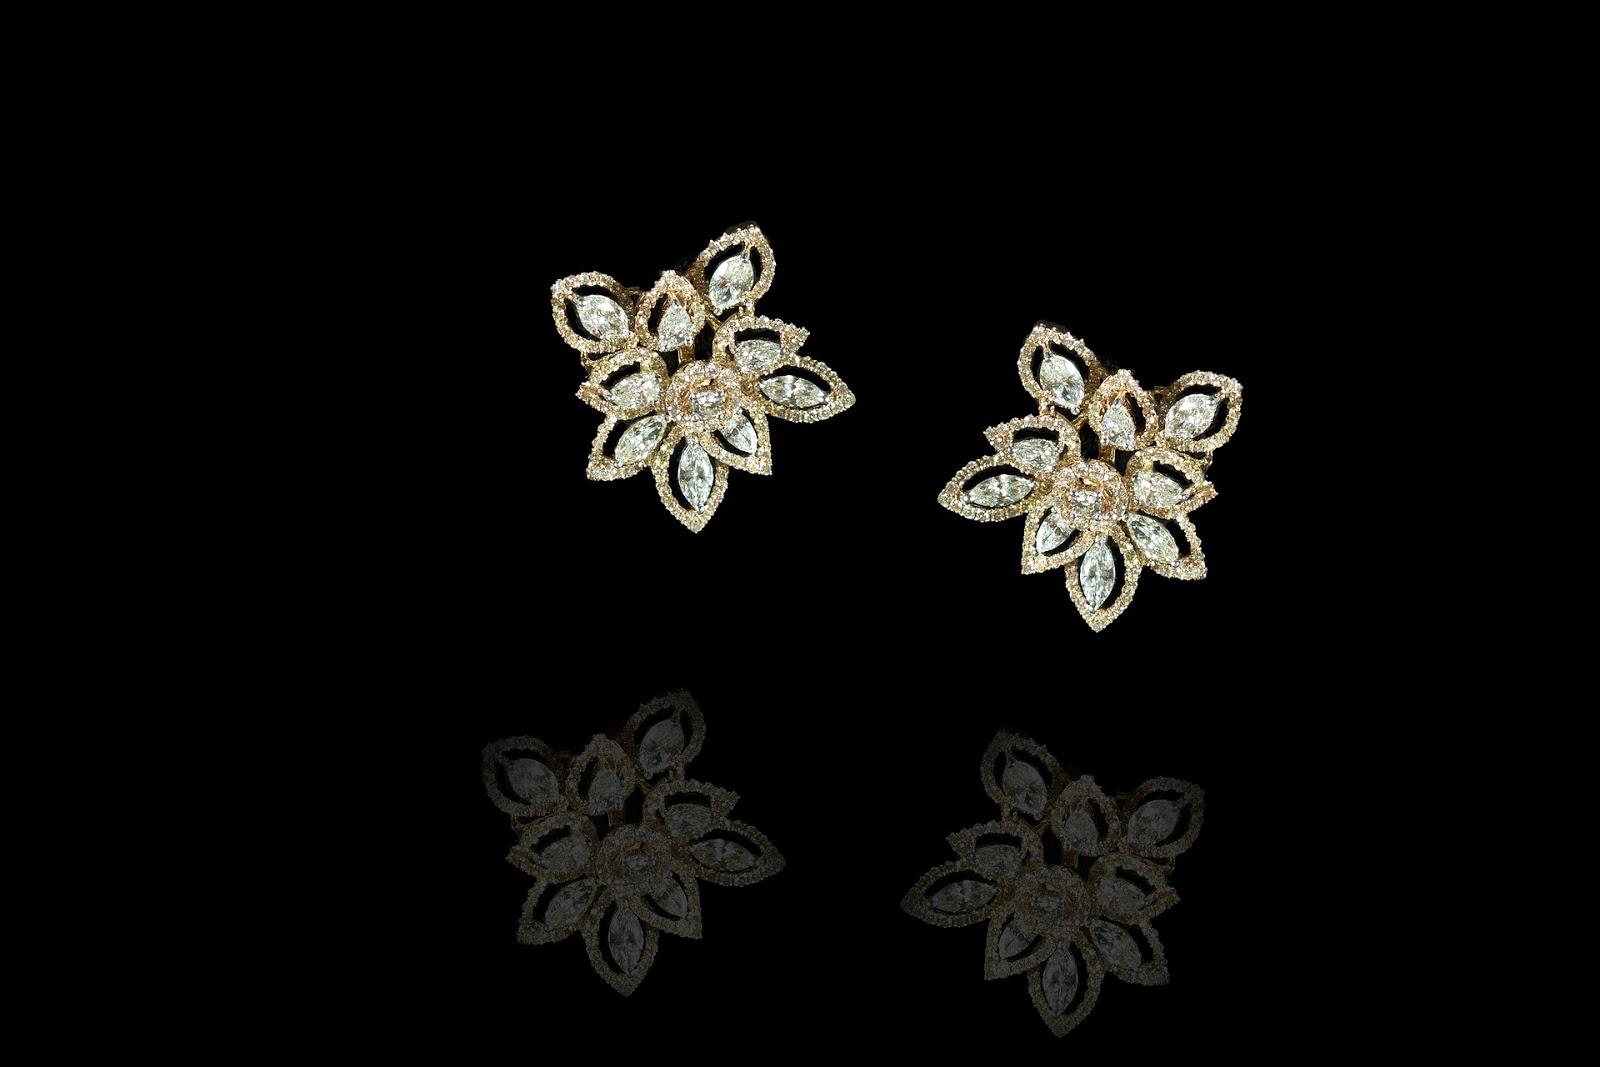 Biżuteria vintage unikatowa na prezent blog modowy stara biżuteria